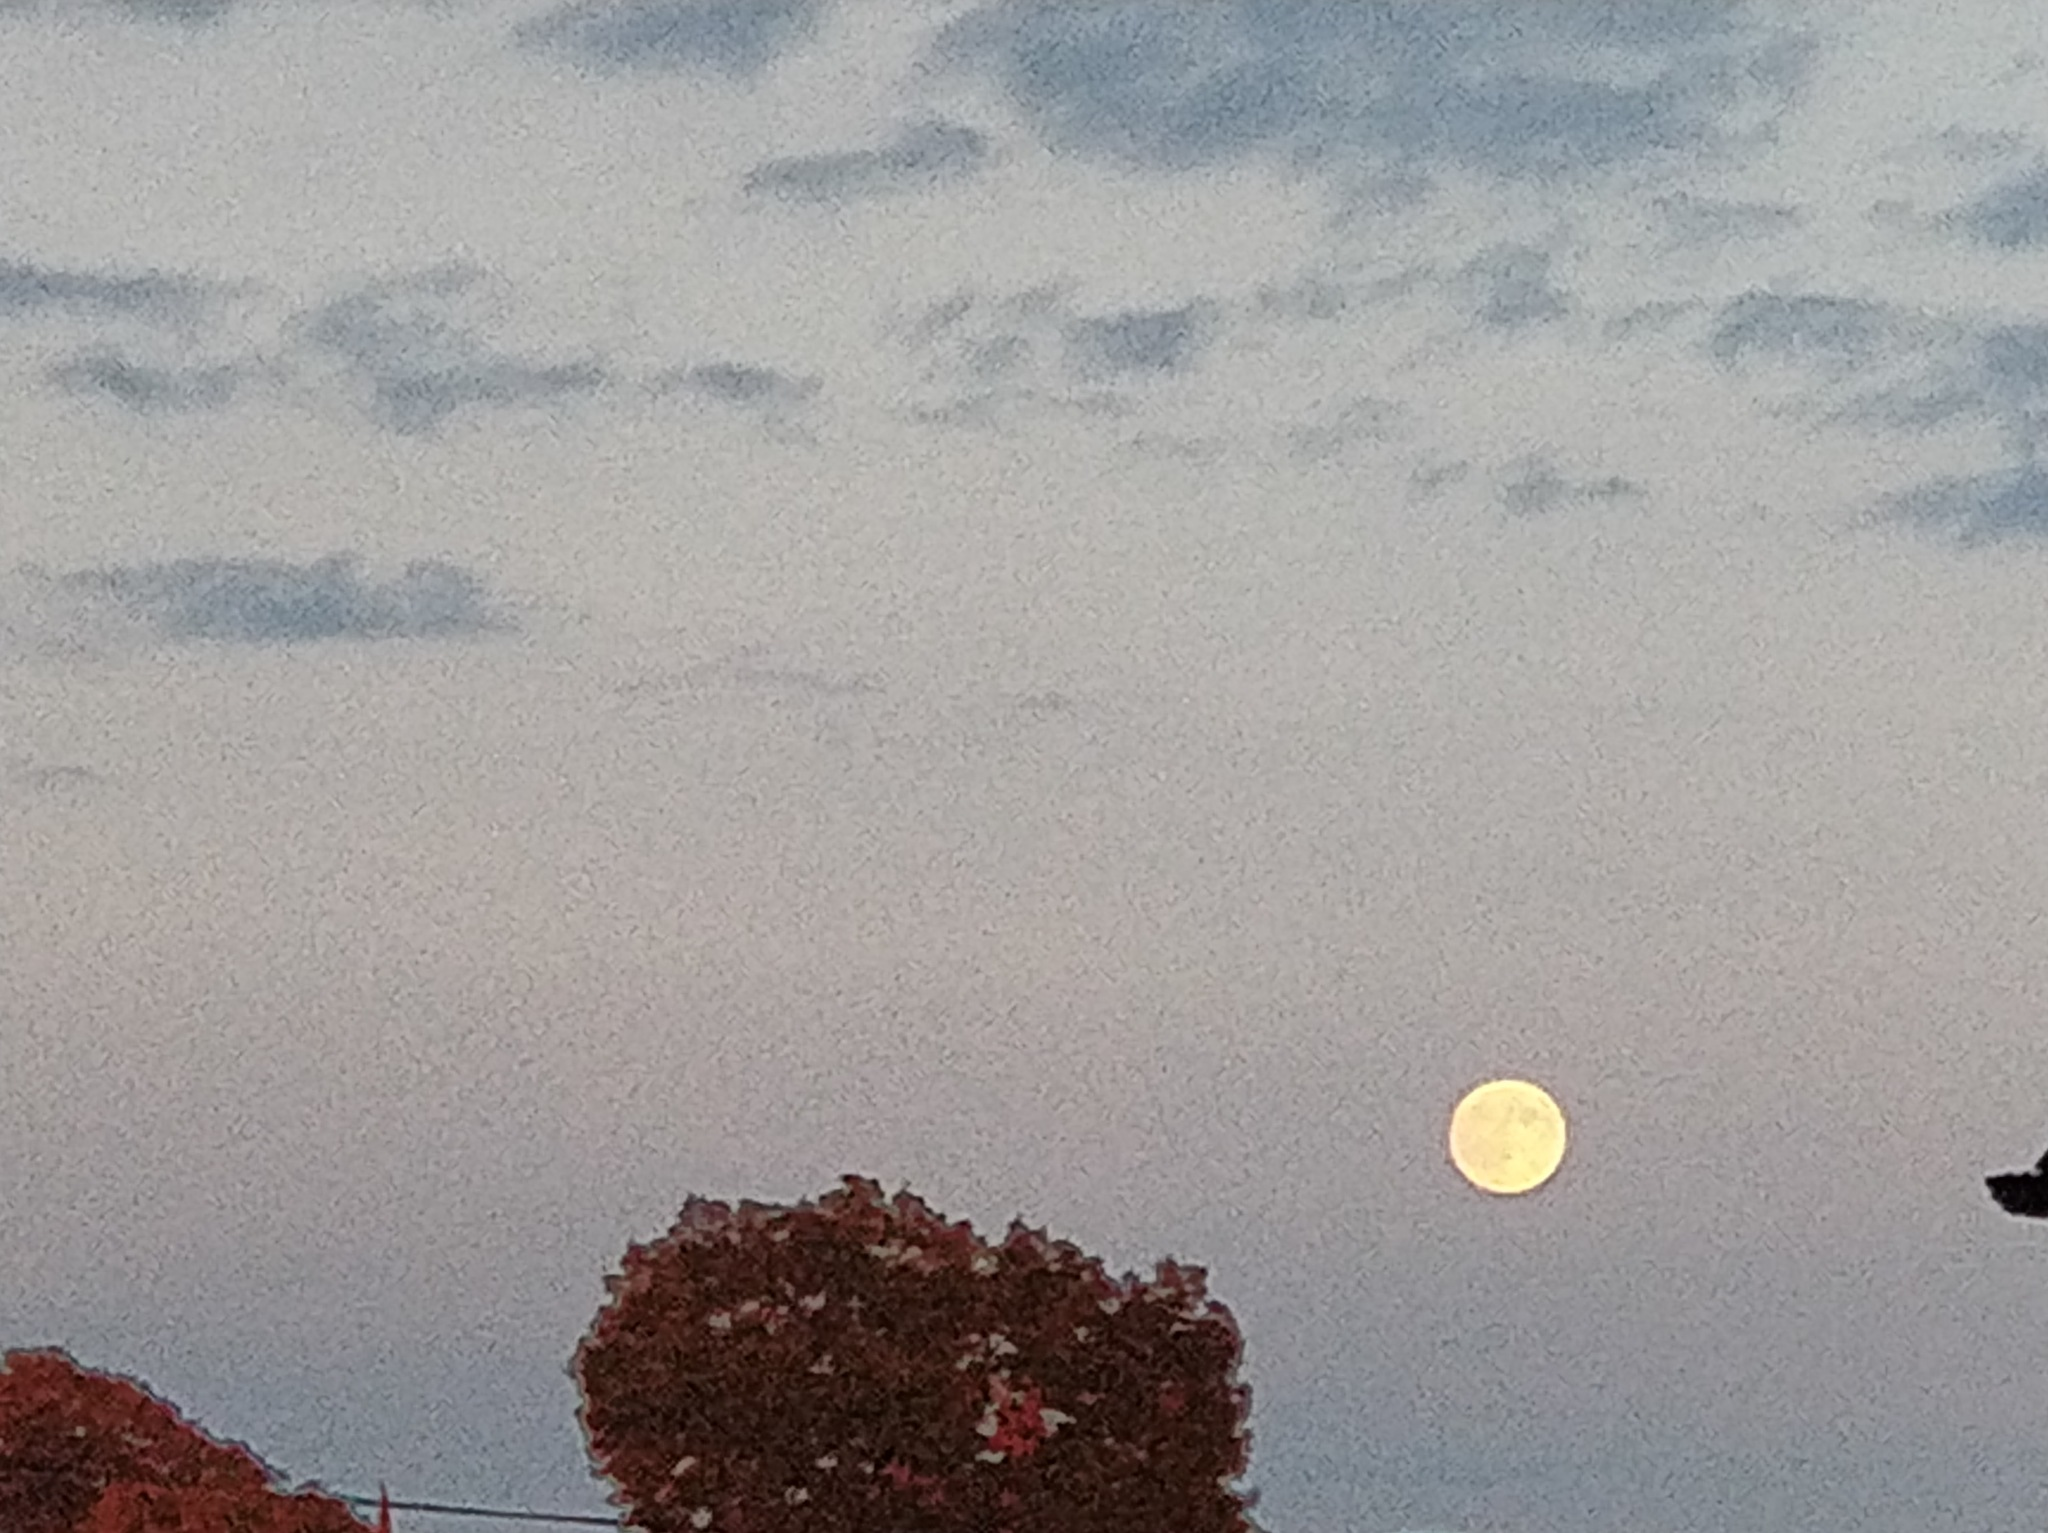 Full Moon by Noel Connolly